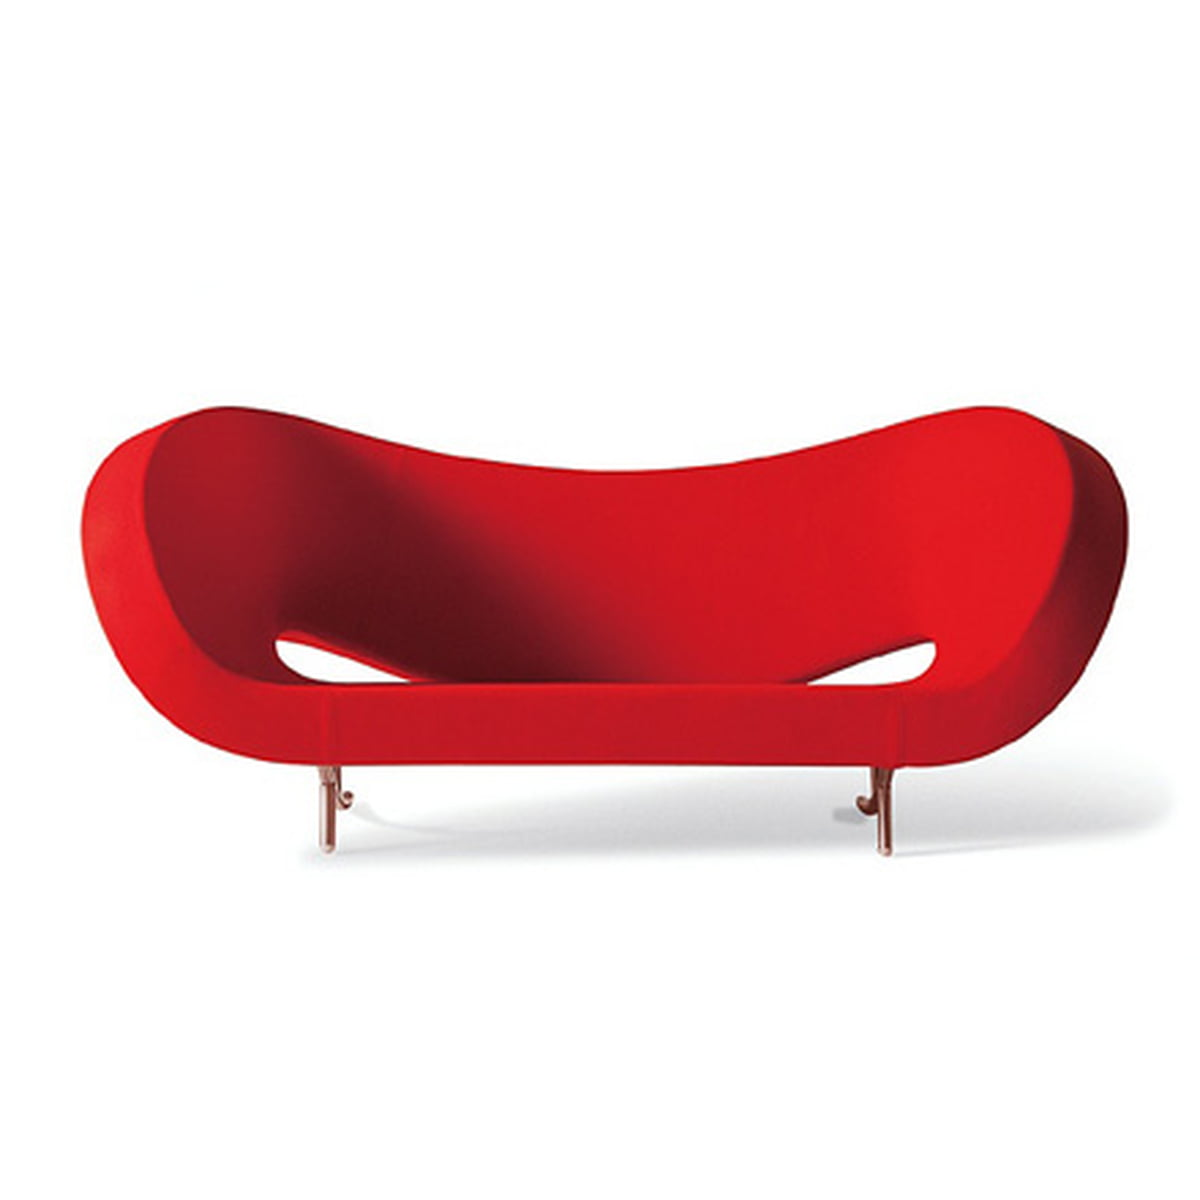 victoria and albert sofa moroso shop. Black Bedroom Furniture Sets. Home Design Ideas